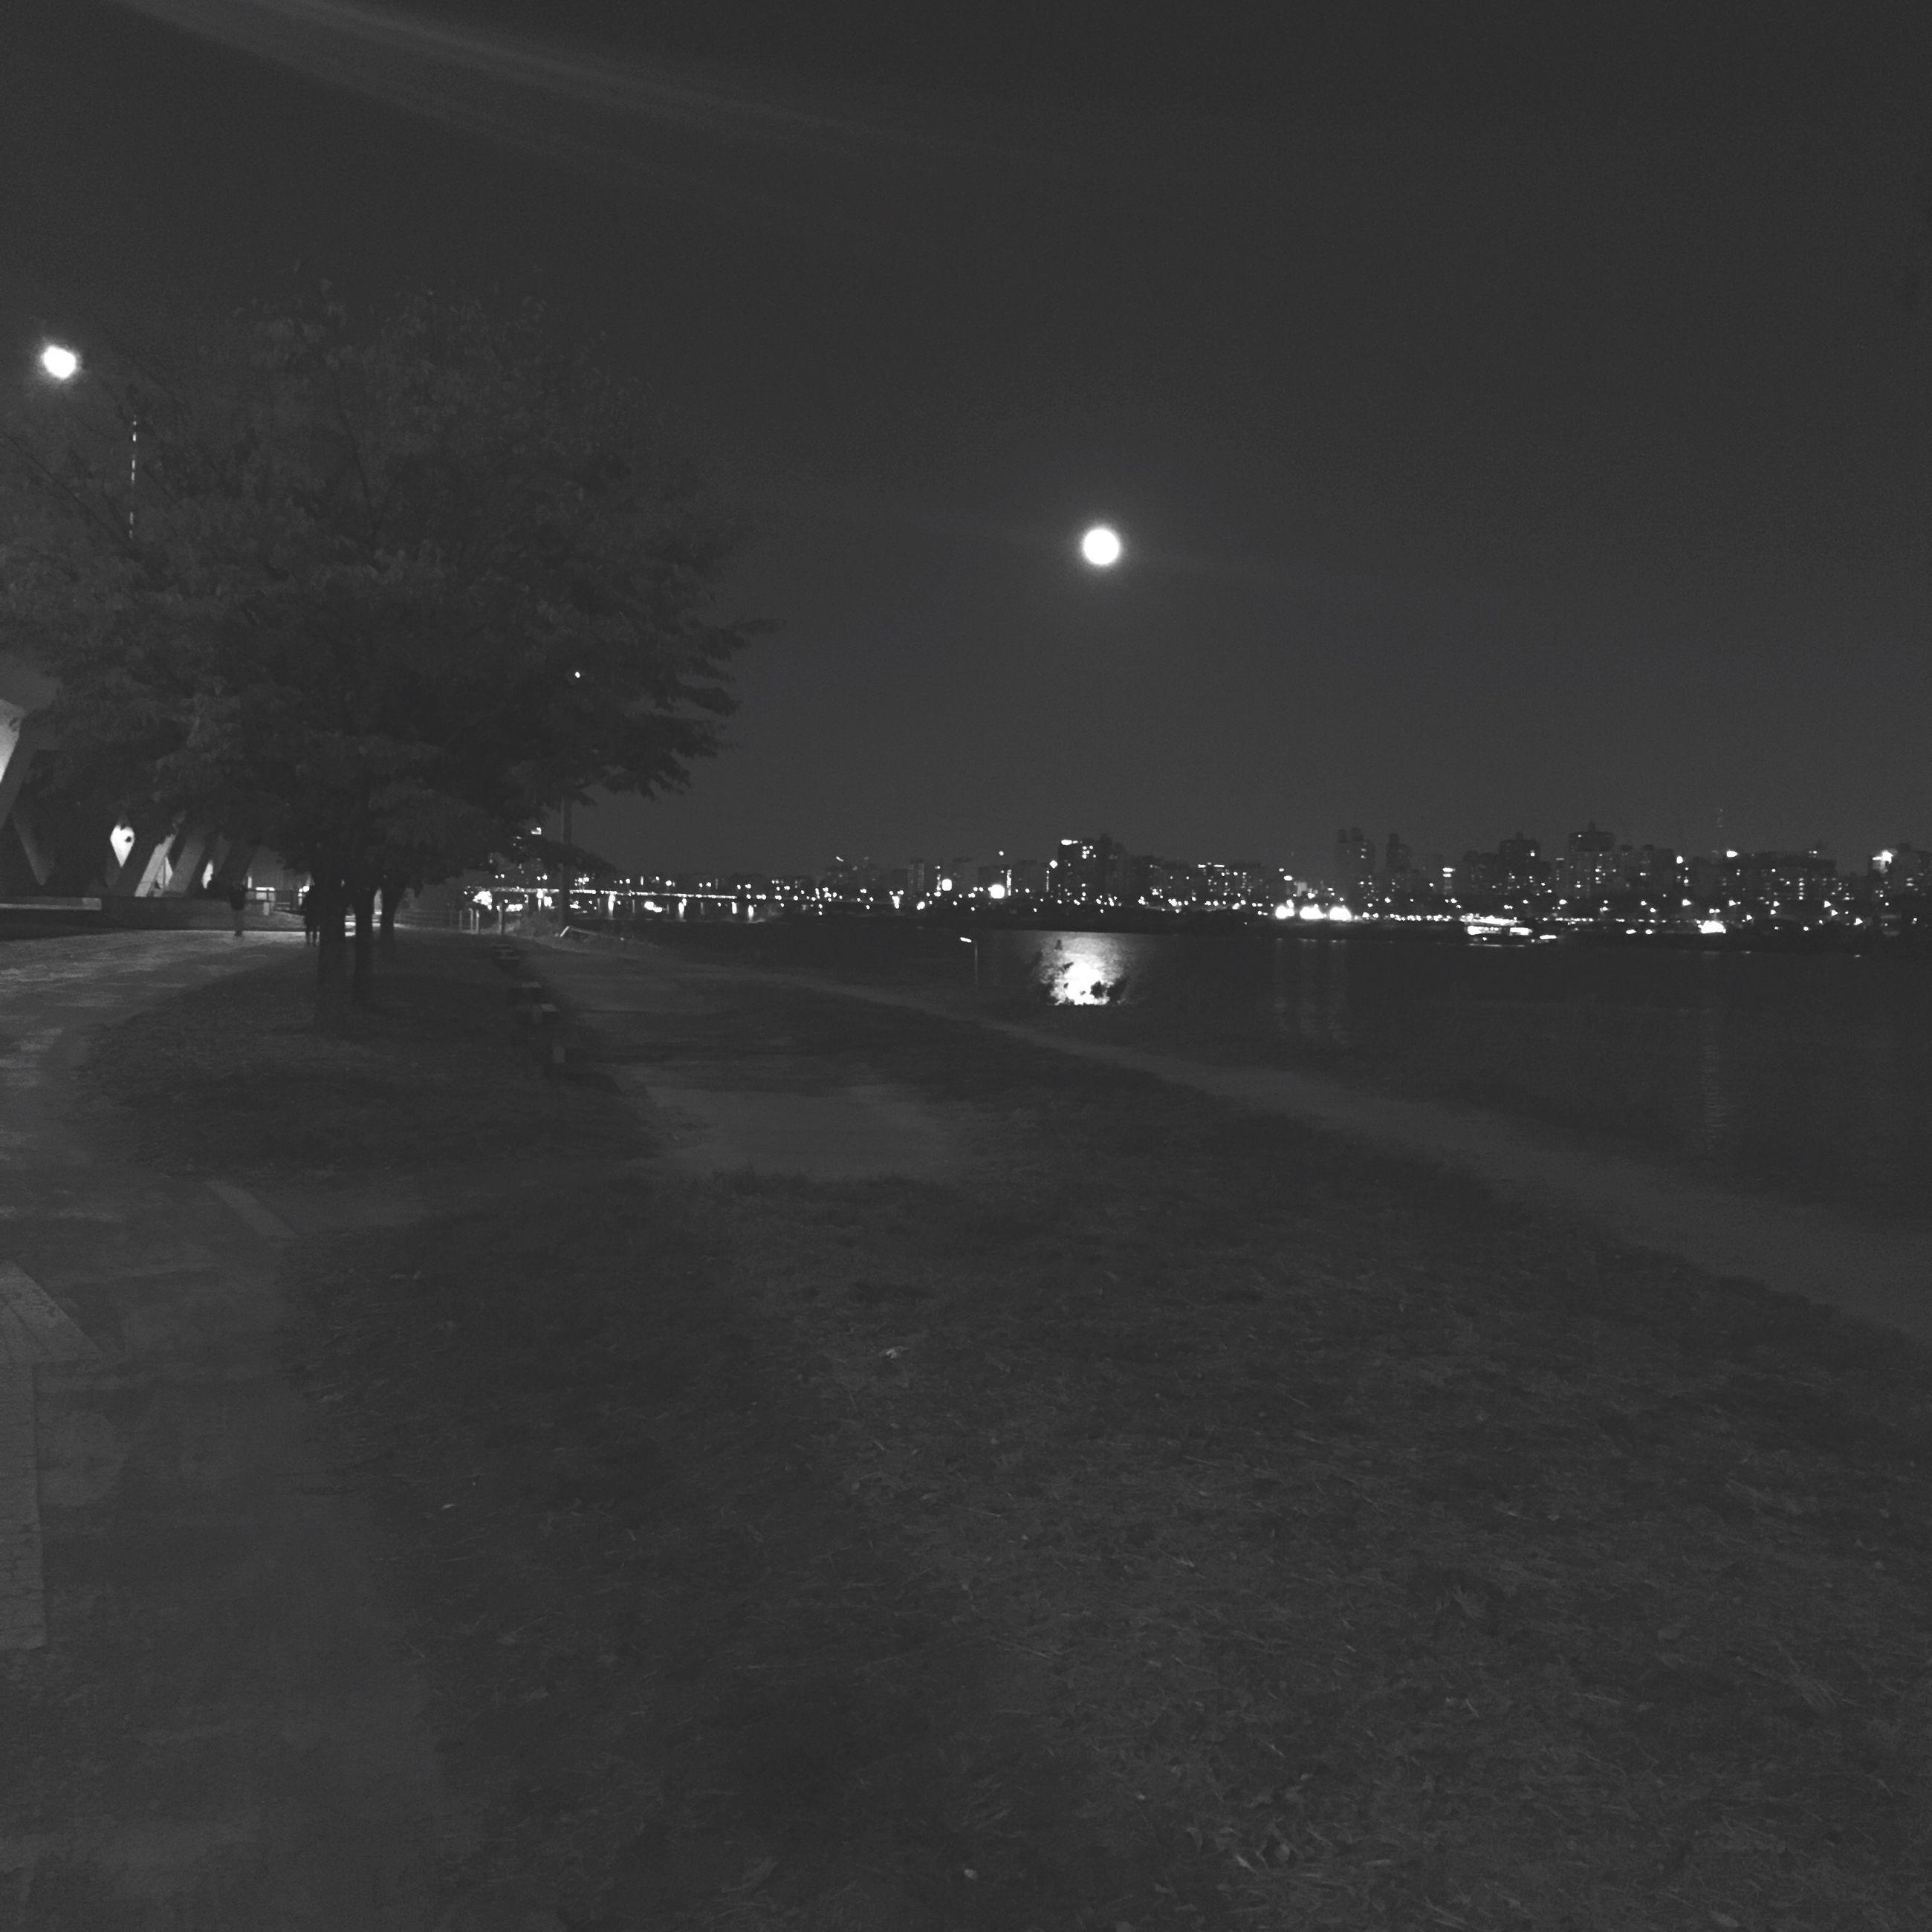 night, illuminated, moon, outdoors, sky, nature, tree, no people, city